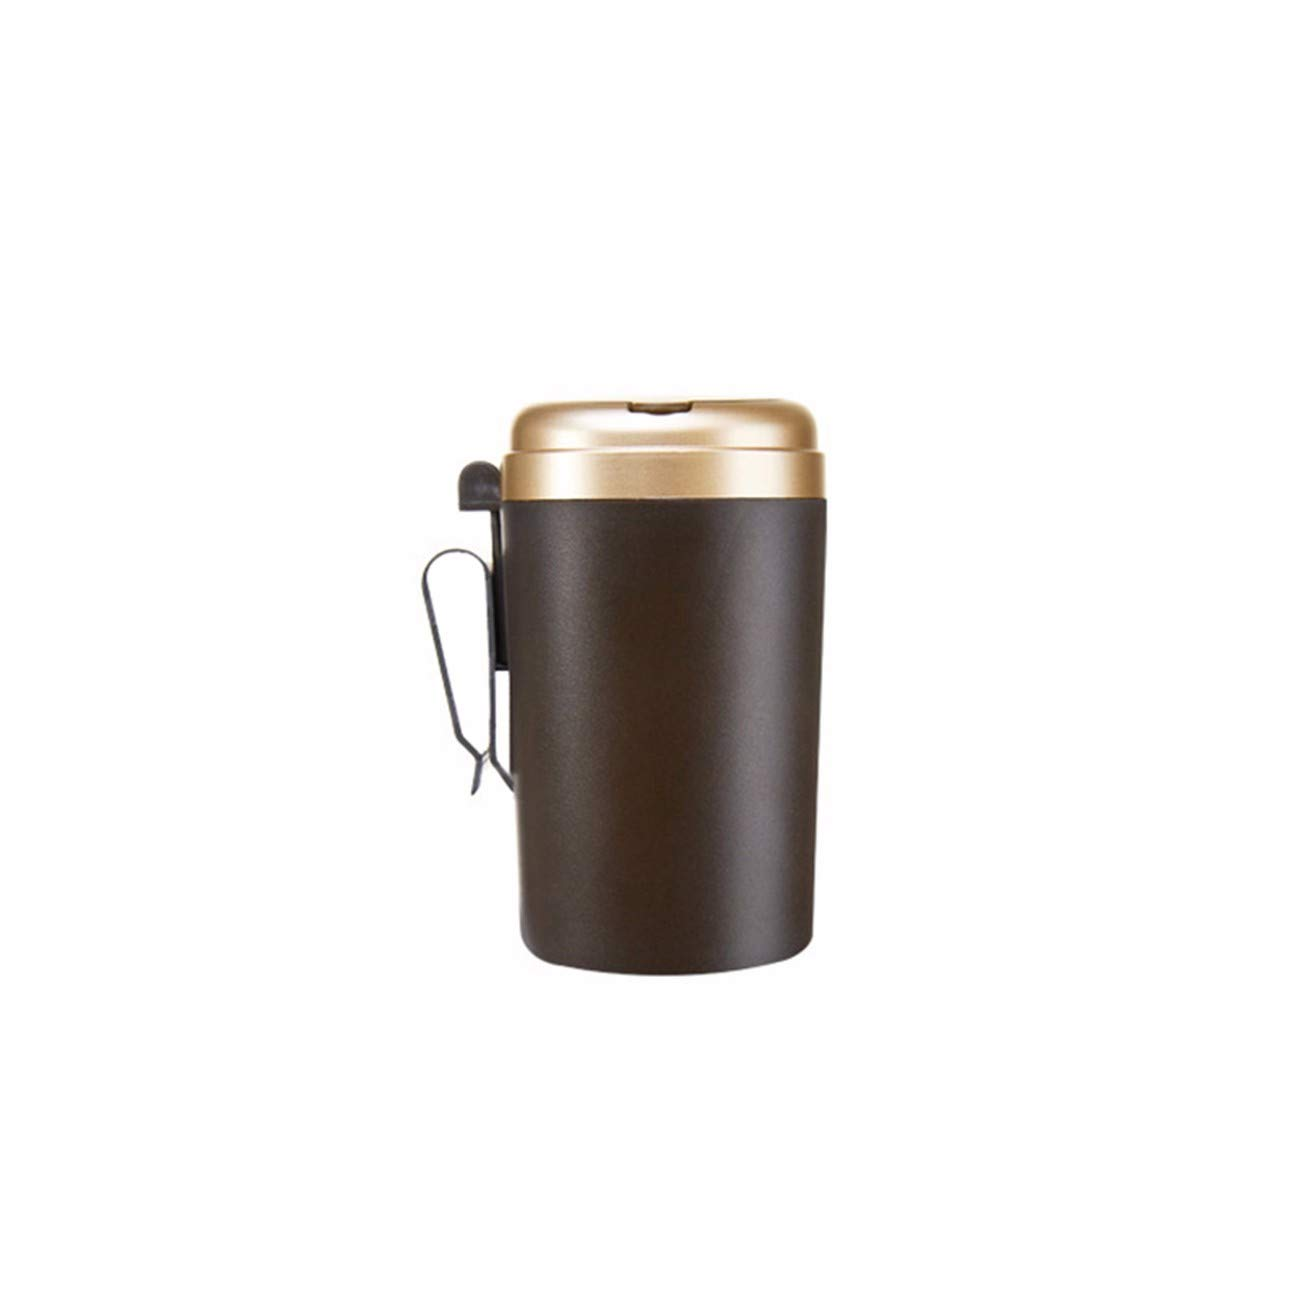 XJTNLB-Mülleimer Müll Werden Kreative Innenraum Garbage Collection Box,B Abfall & Recycling Aufbewahren & Ordnen